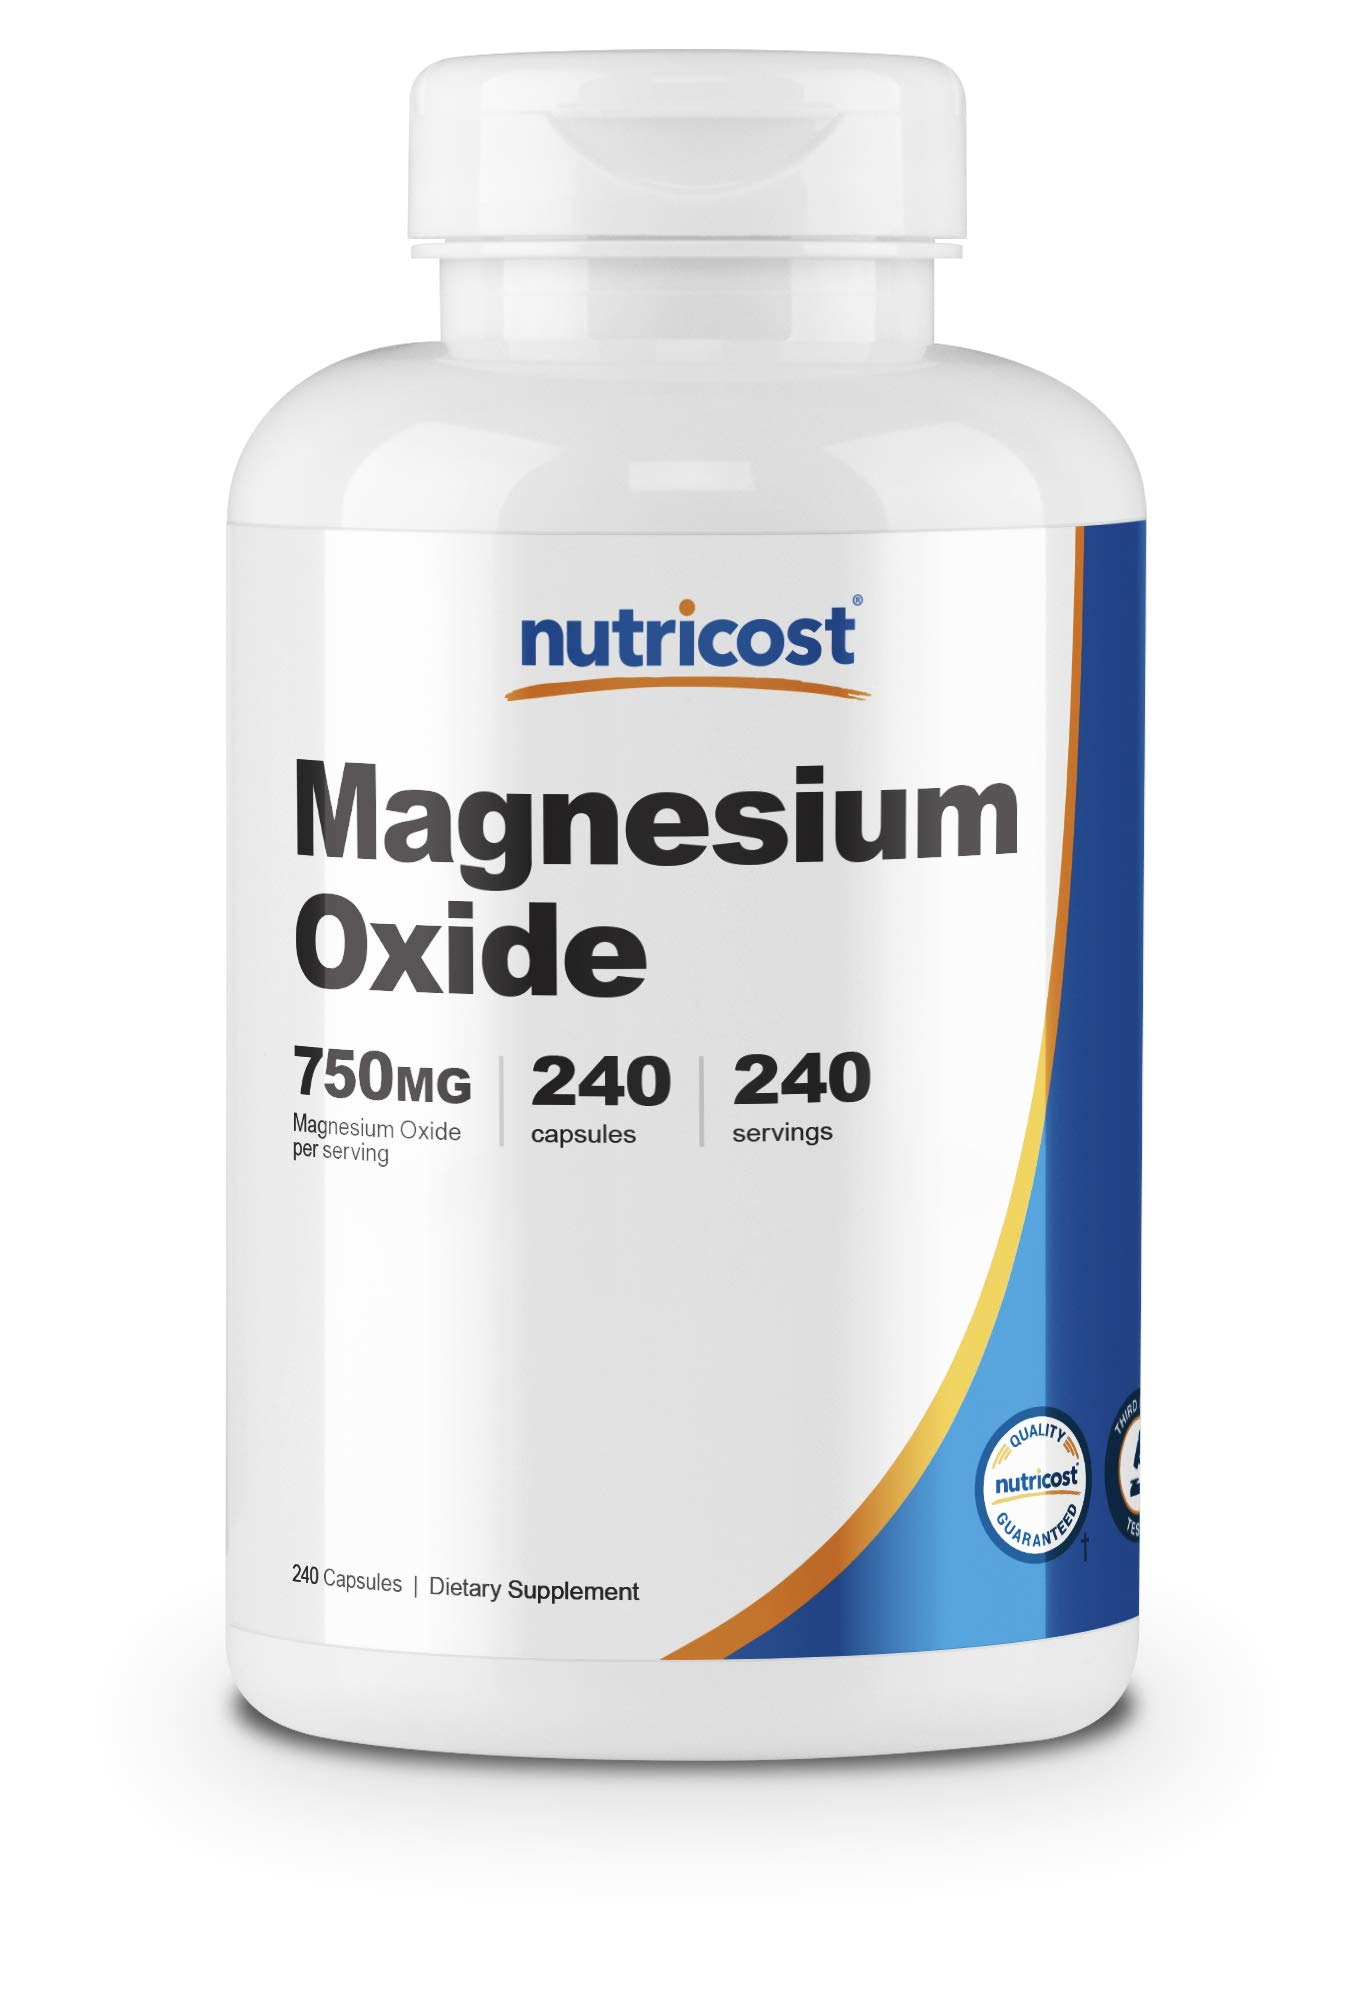 Nutricost Magnesium Oxide 750mg, 240 Capsules - 420mg of Magnesium, Non-GMO, Gluten Free